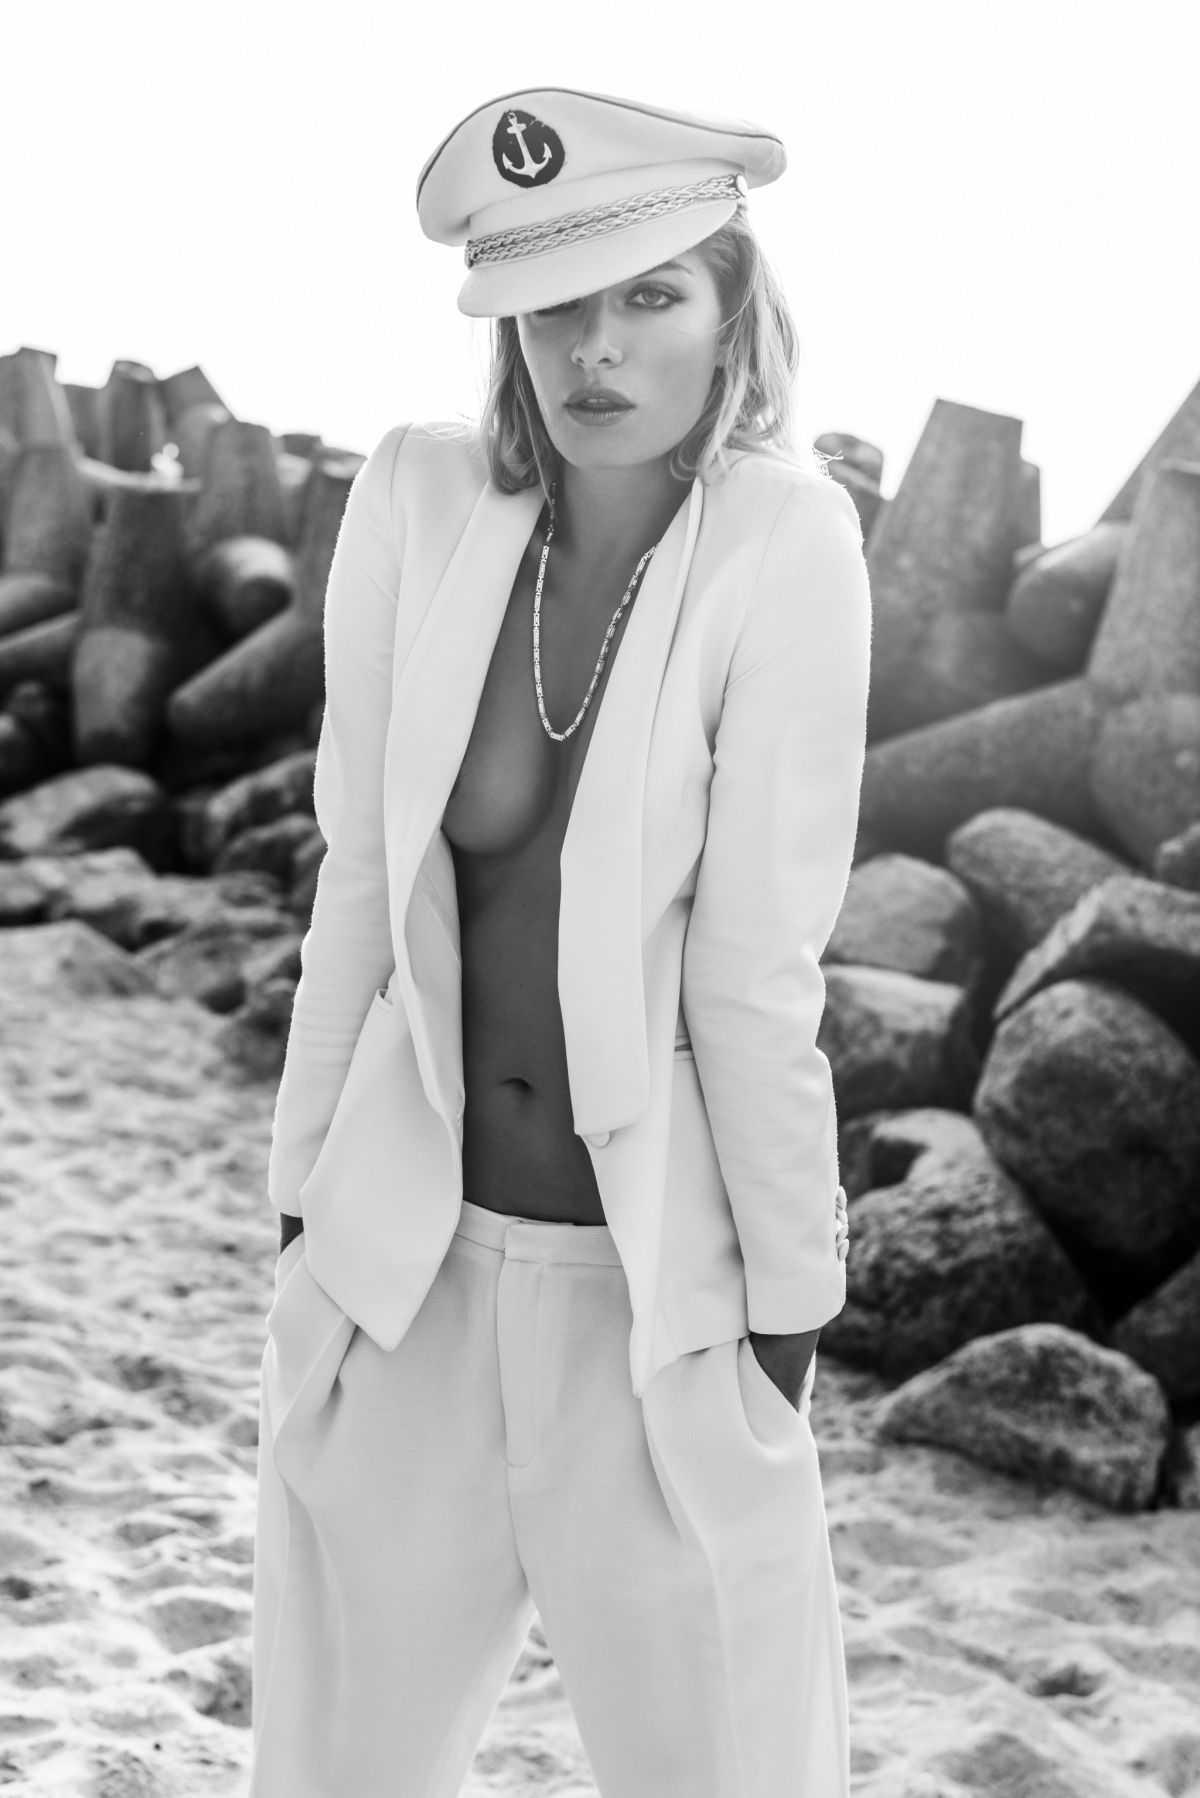 Tatána Kucharová sexy cleavage